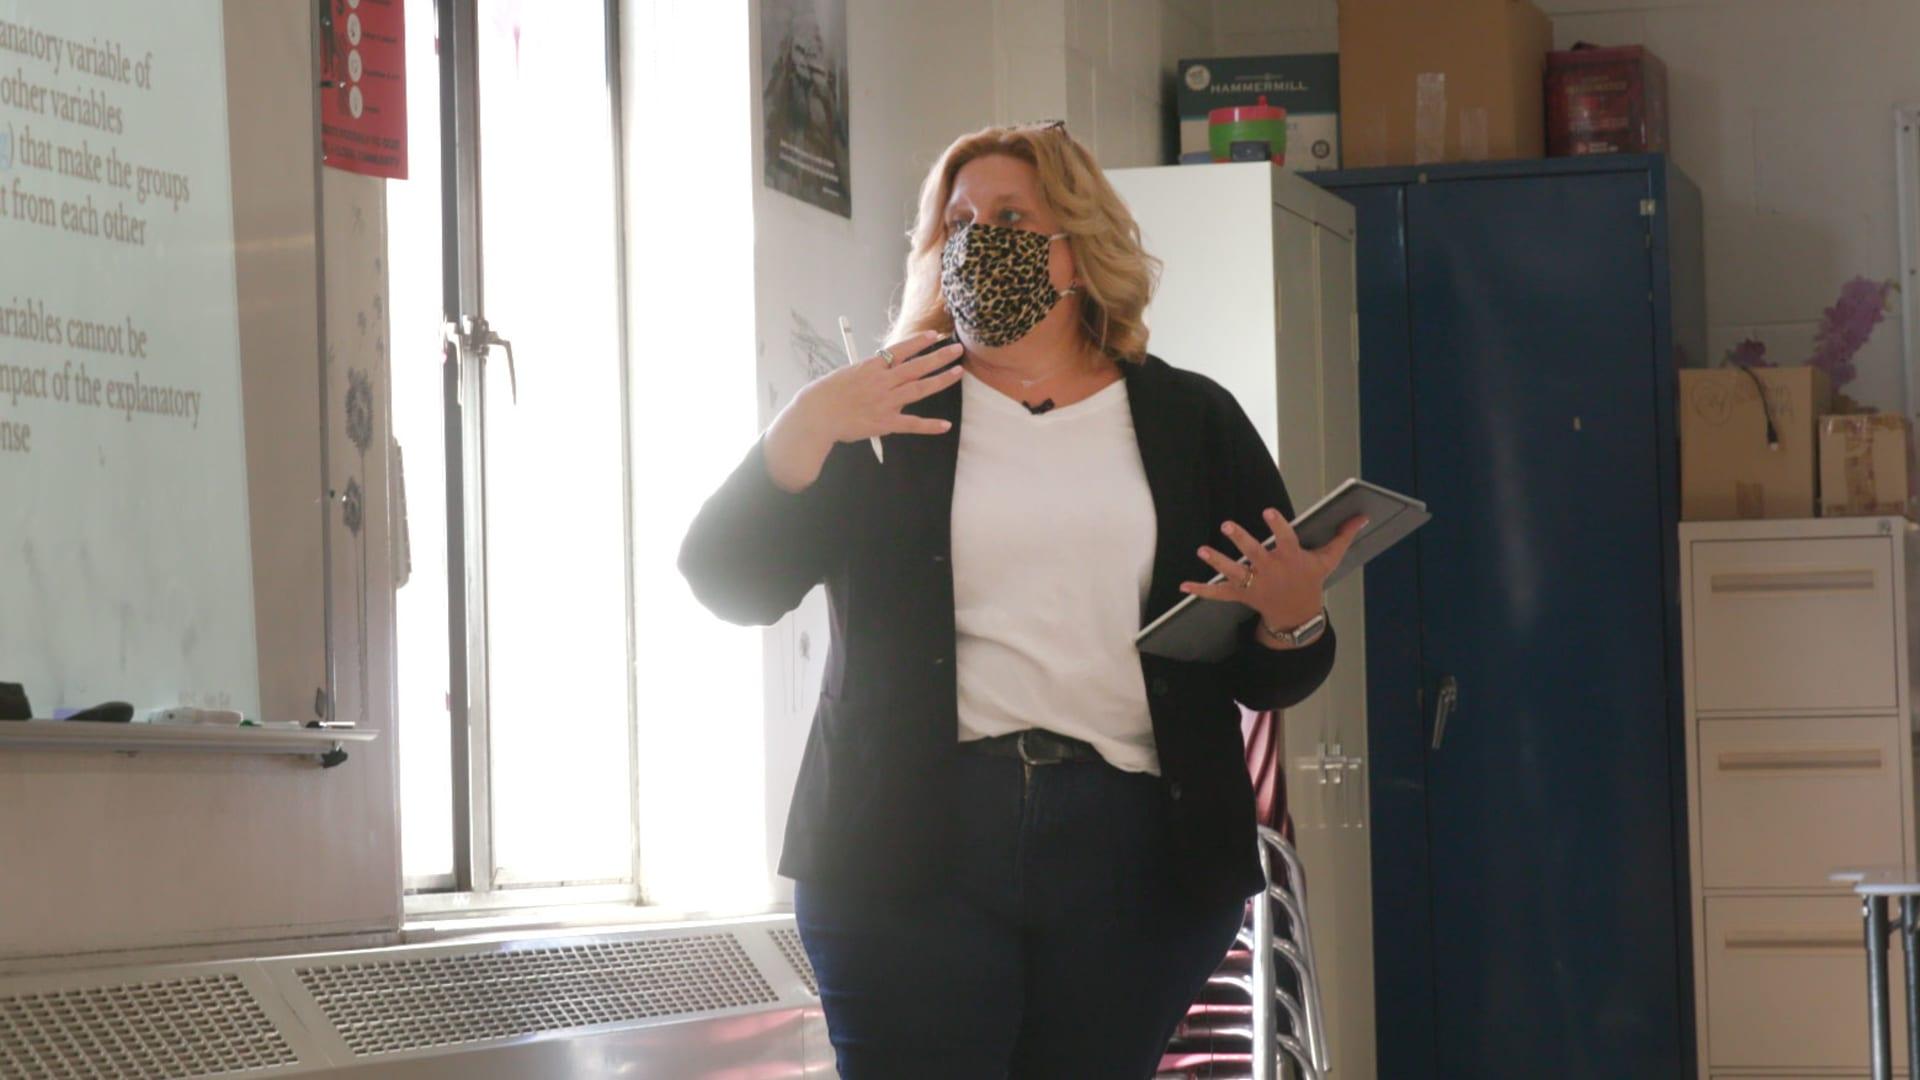 Kate Dias, Math and Statistics teacher at Manchester High School in Manchester, Connecticut